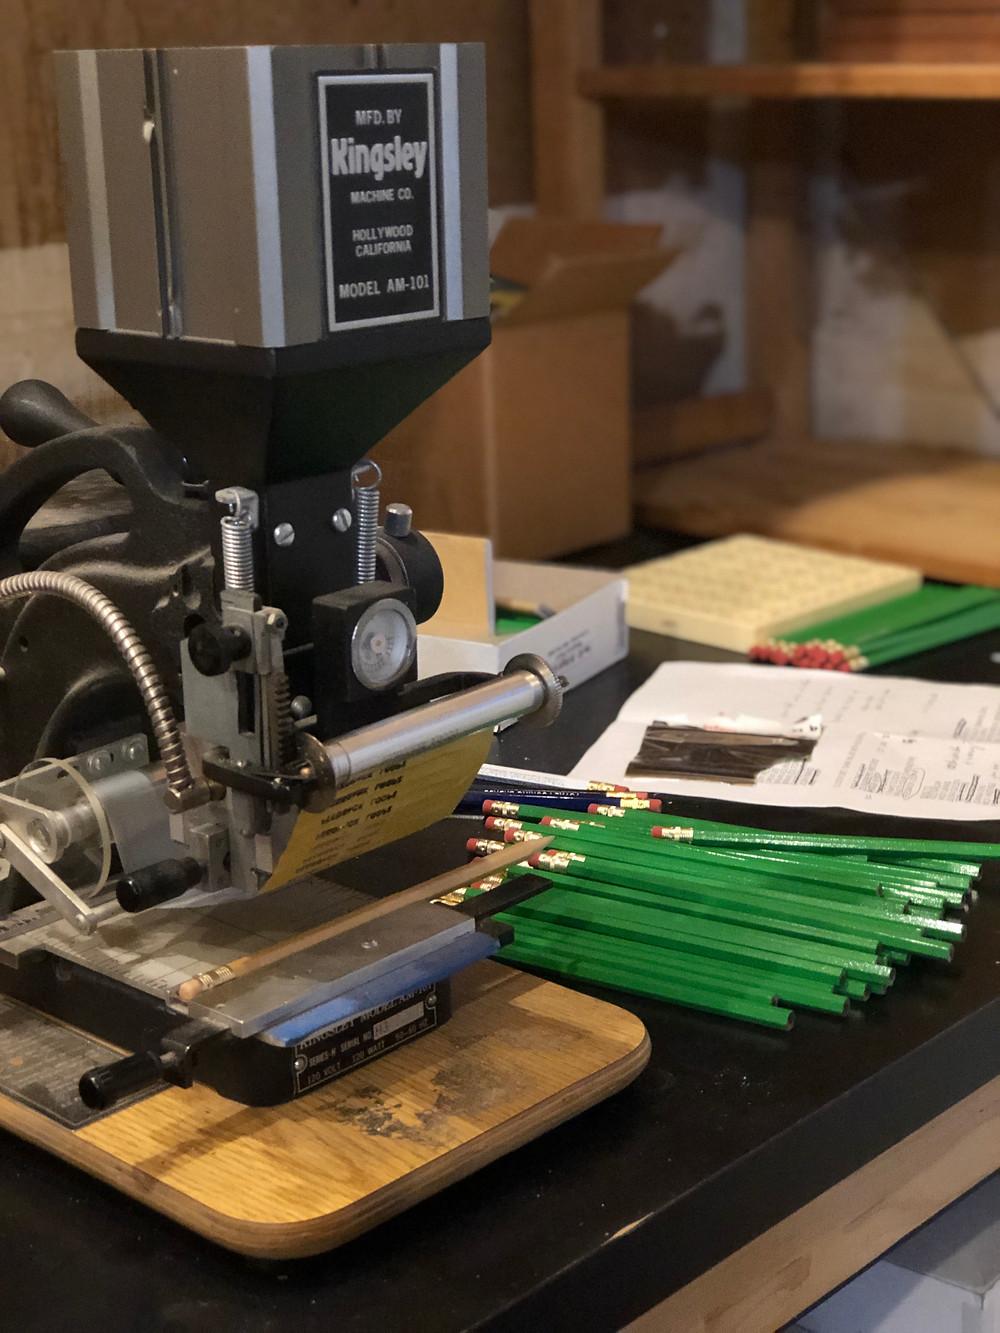 Kingsley pencil stamping machine